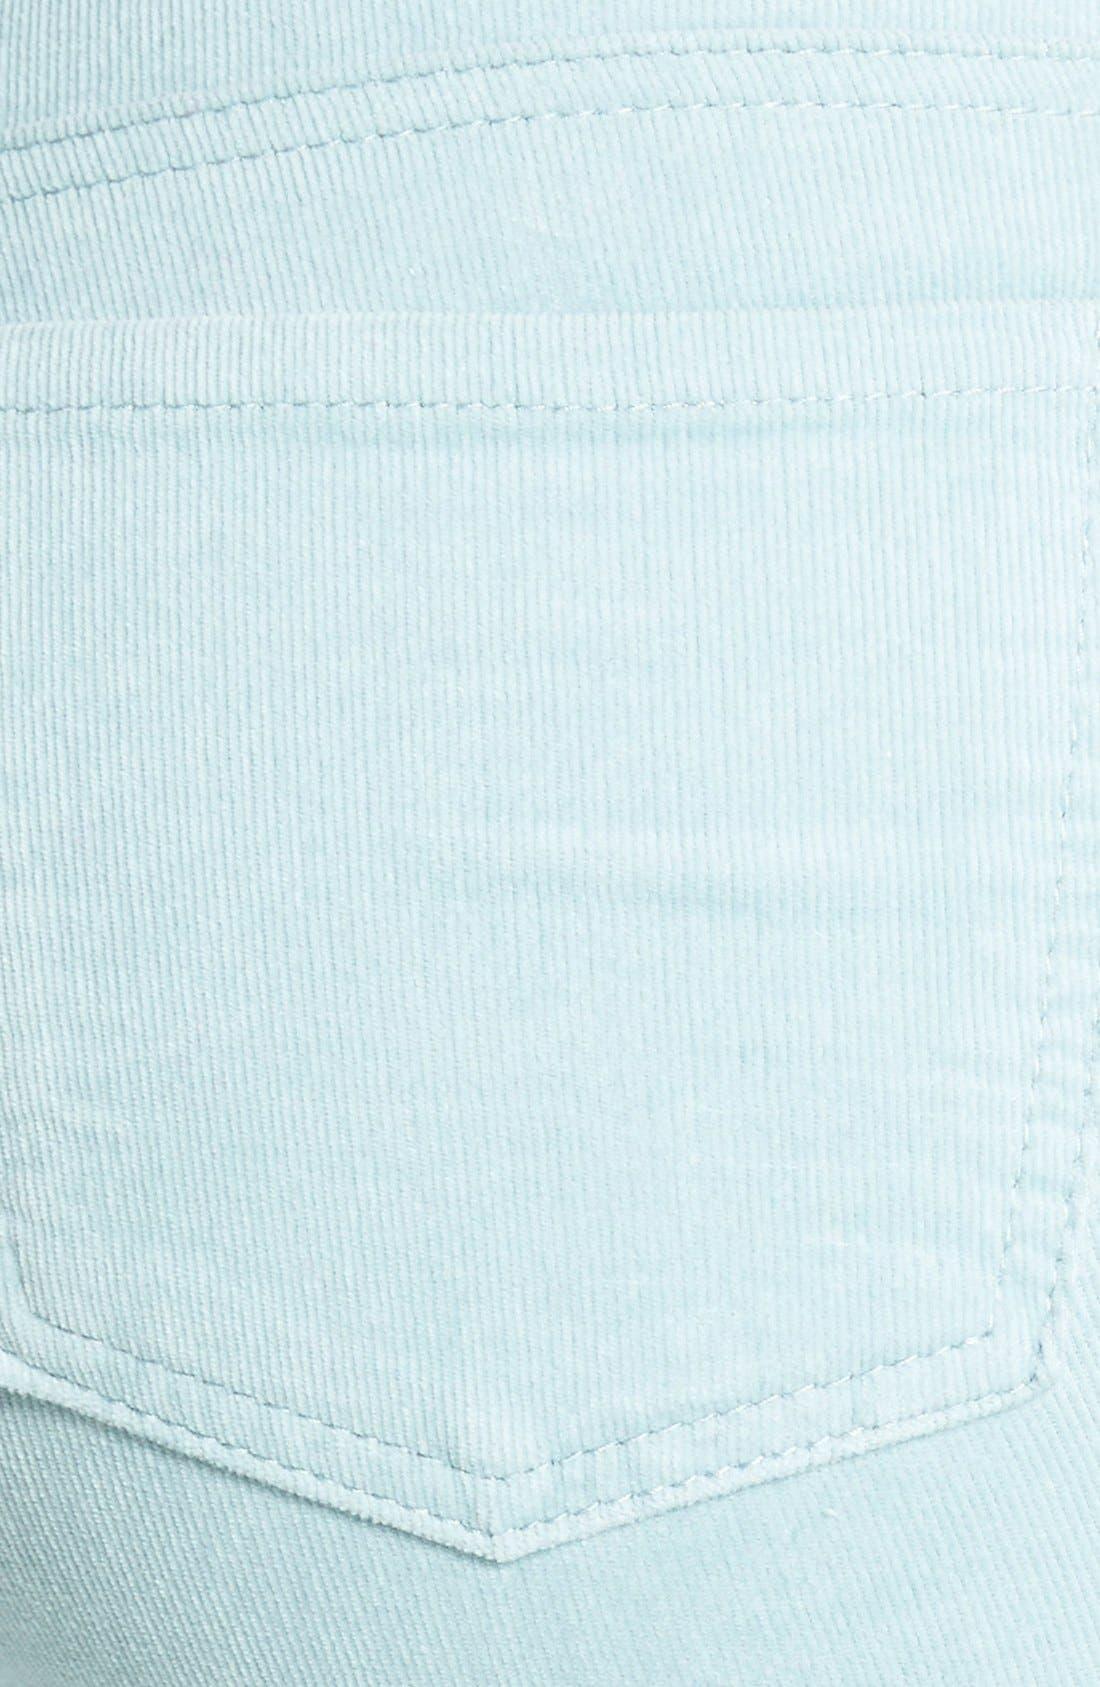 'Diana' Stretch Corduroy Skinny Pants,                             Alternate thumbnail 84, color,